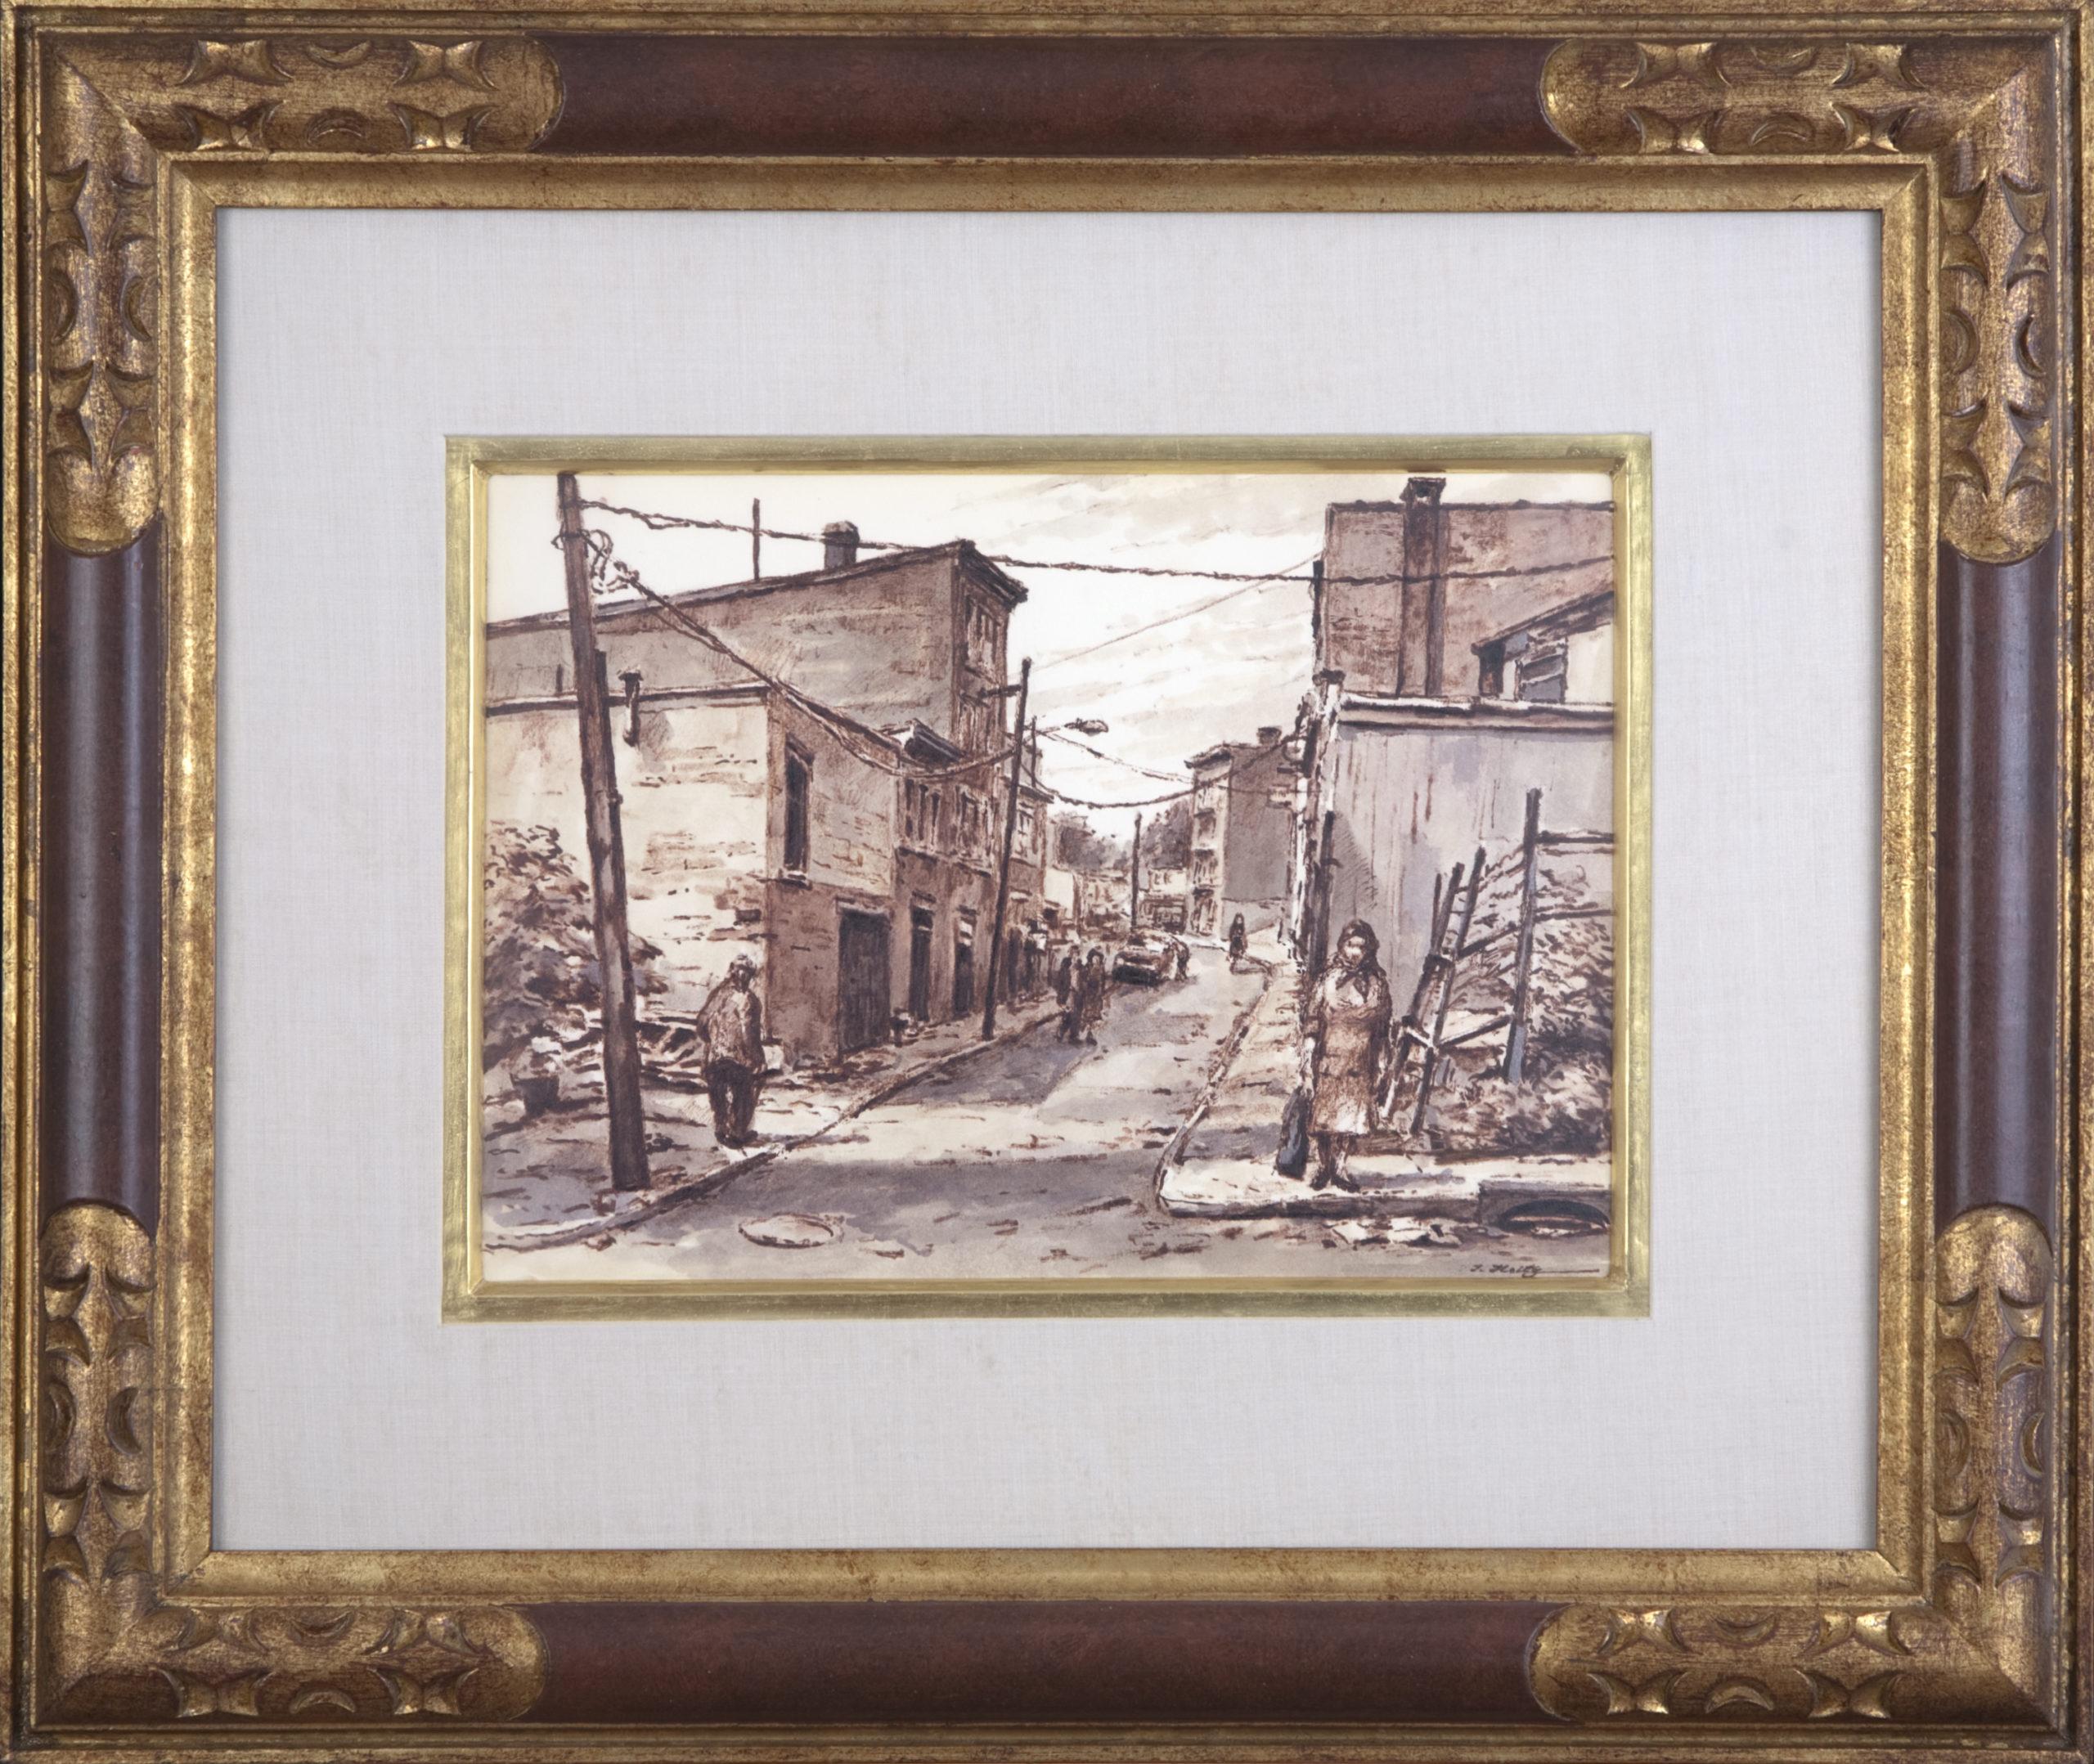 161 Yonkers Street 1970 - Felt Pen & Wash - 12 x 8.75 - Frame: 22 x 18.5 x 1.25